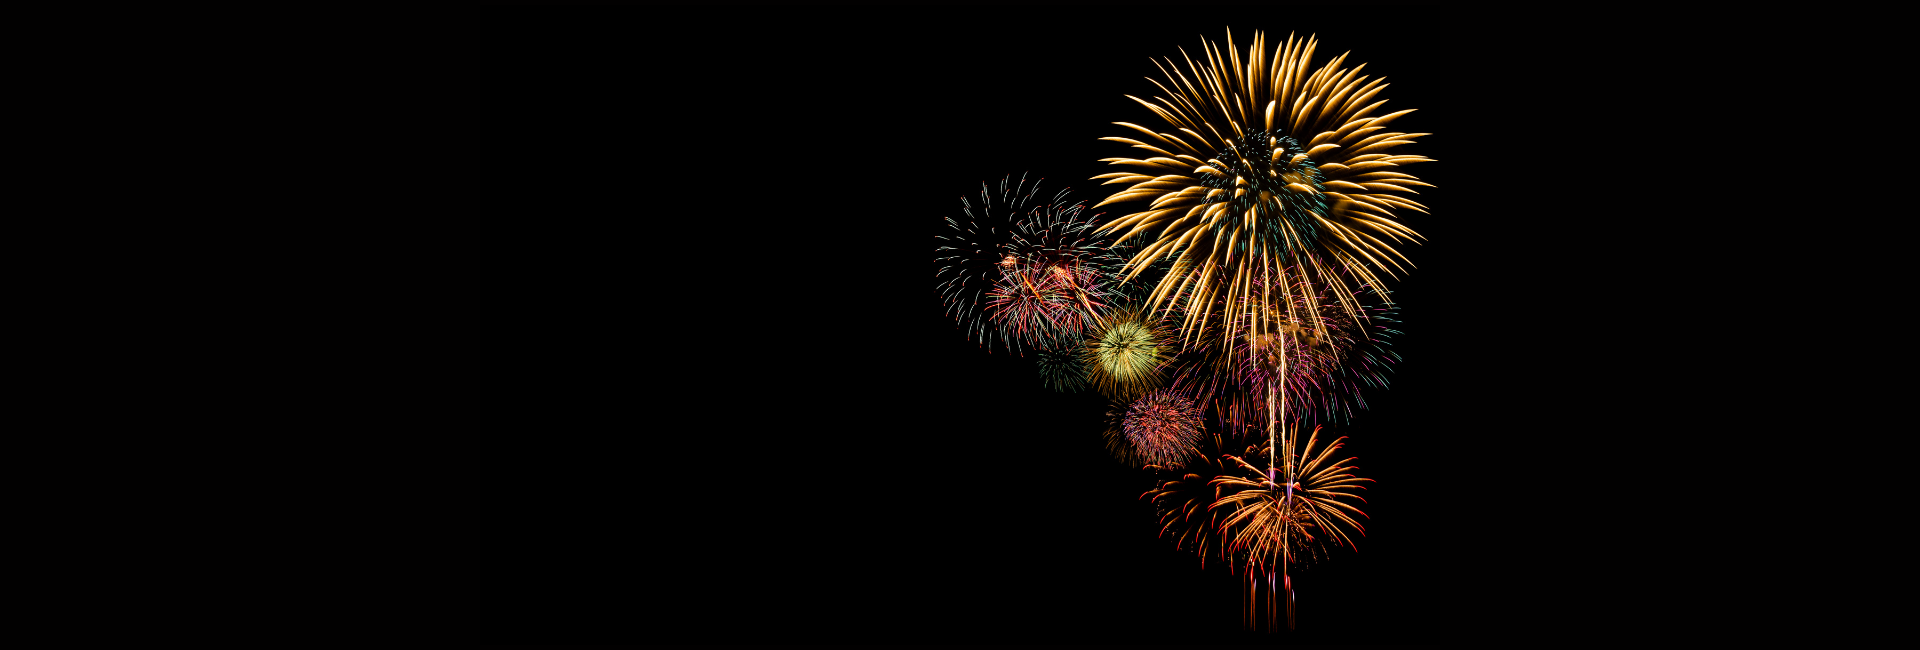 Espetáculo de Fogo-de-artifício de dia 14 de Agosto adiado